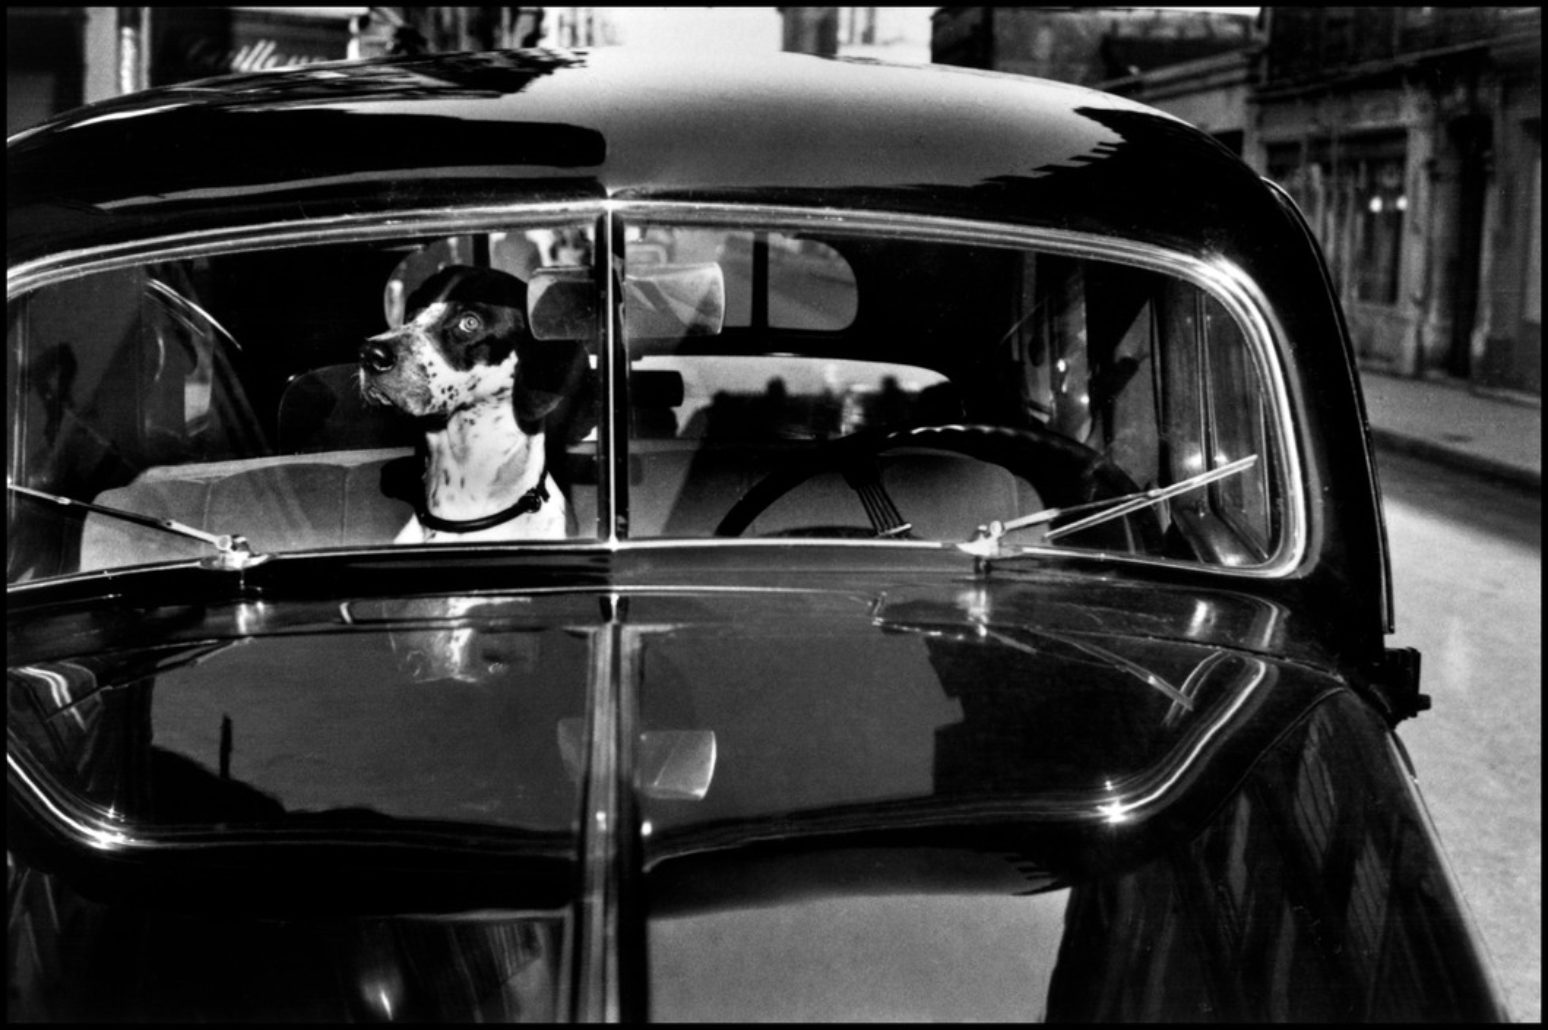 Paris, France (dog in car)